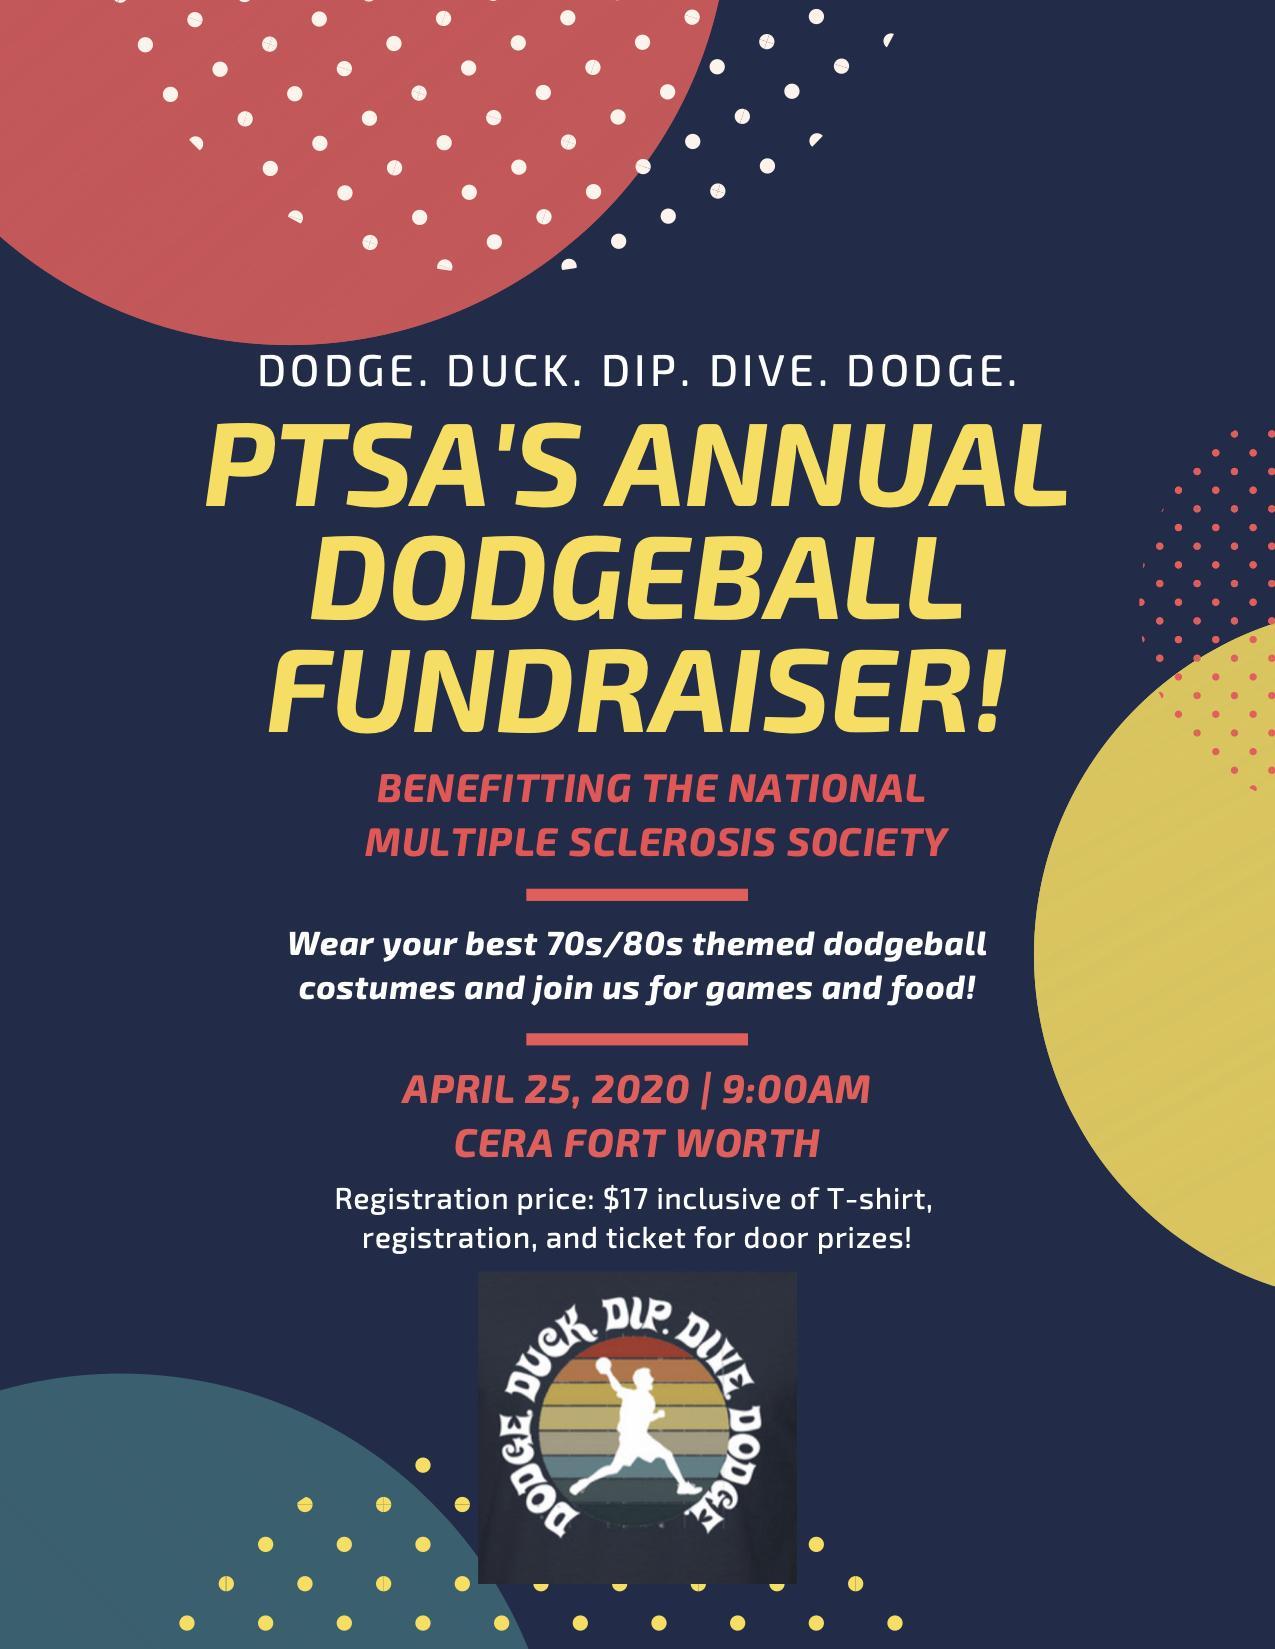 PTSA's Annual Dodgeball Tournament - POSTPONED INDEFINITELY, DATE PENDING